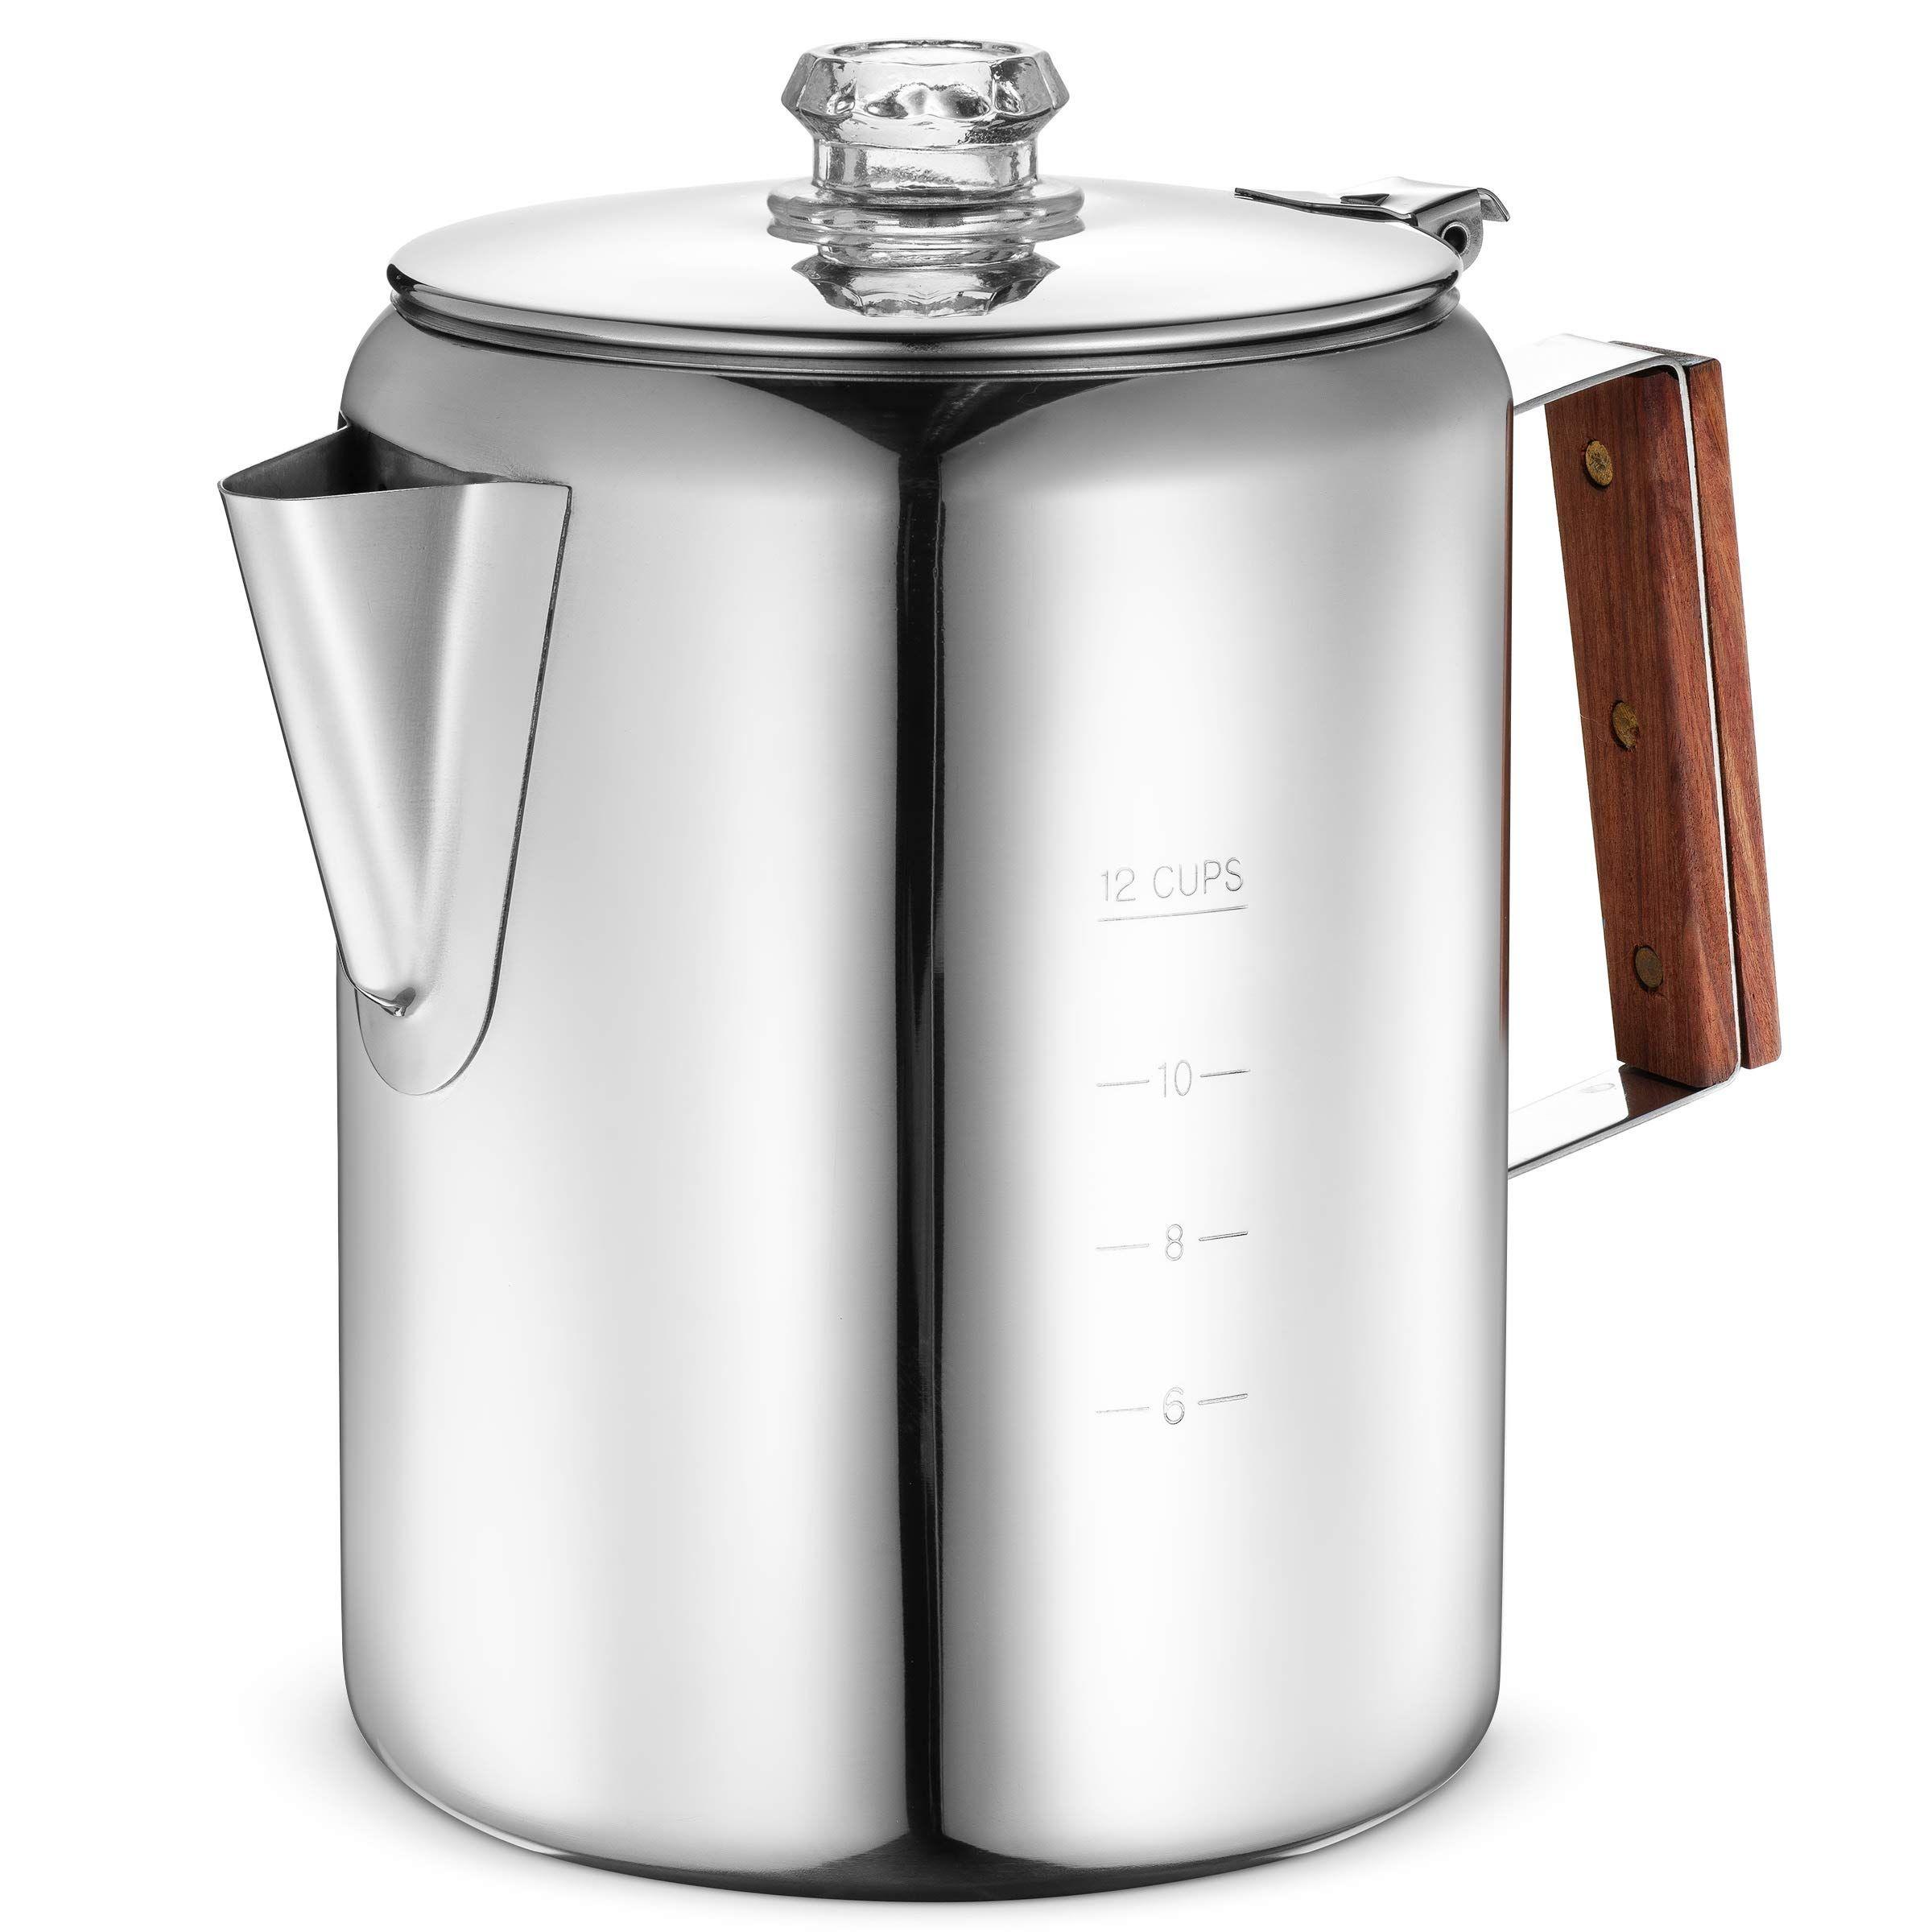 Eurolux Percolator Coffee Maker Pot 12 Cups Durable